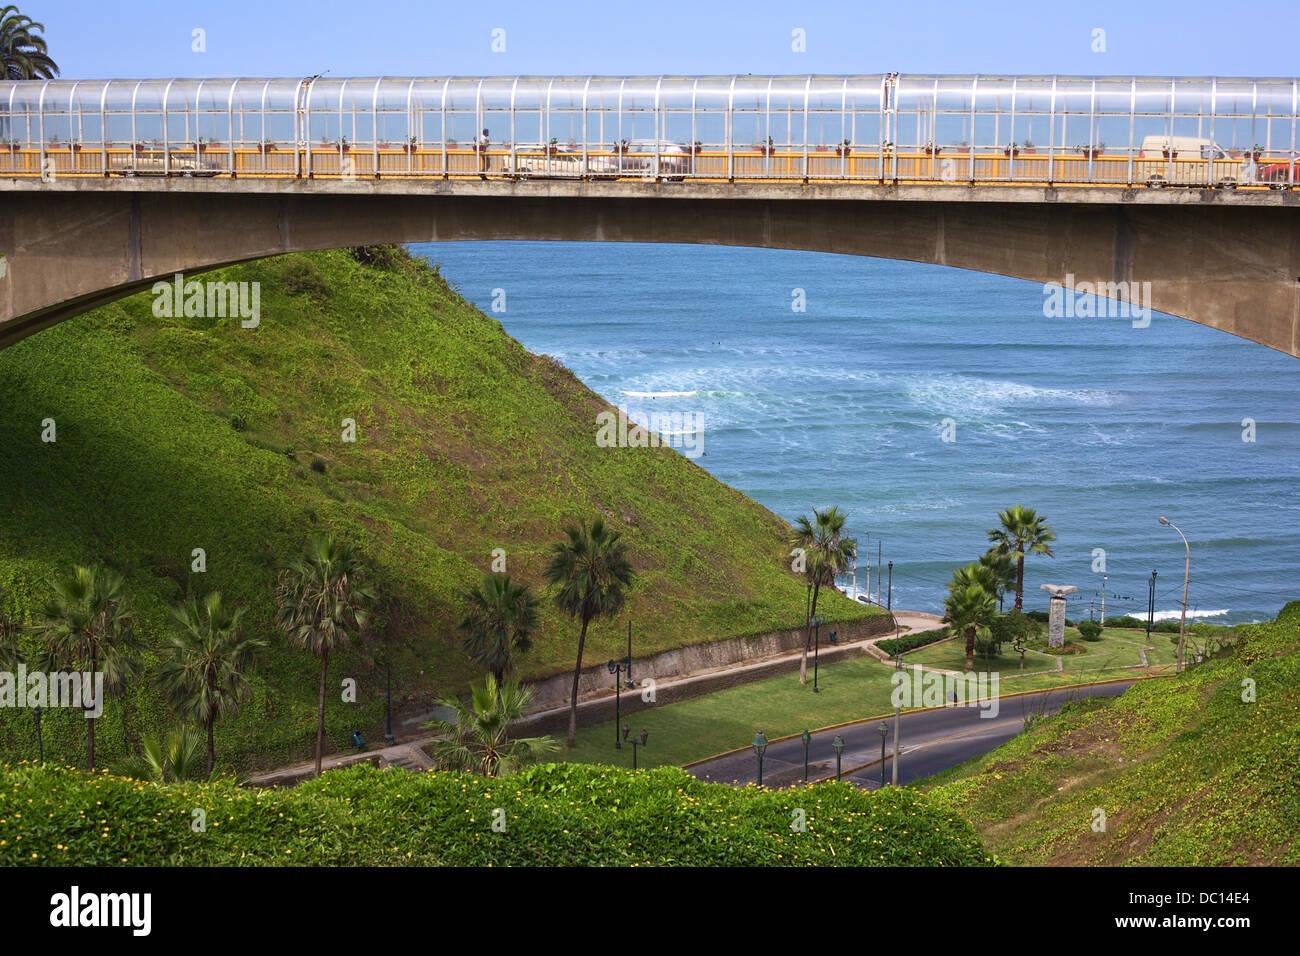 E. Villena Rey Bridge over the street Bajada Balta leading down to the coast of Miraflores, Lima, Peru Stock Photo